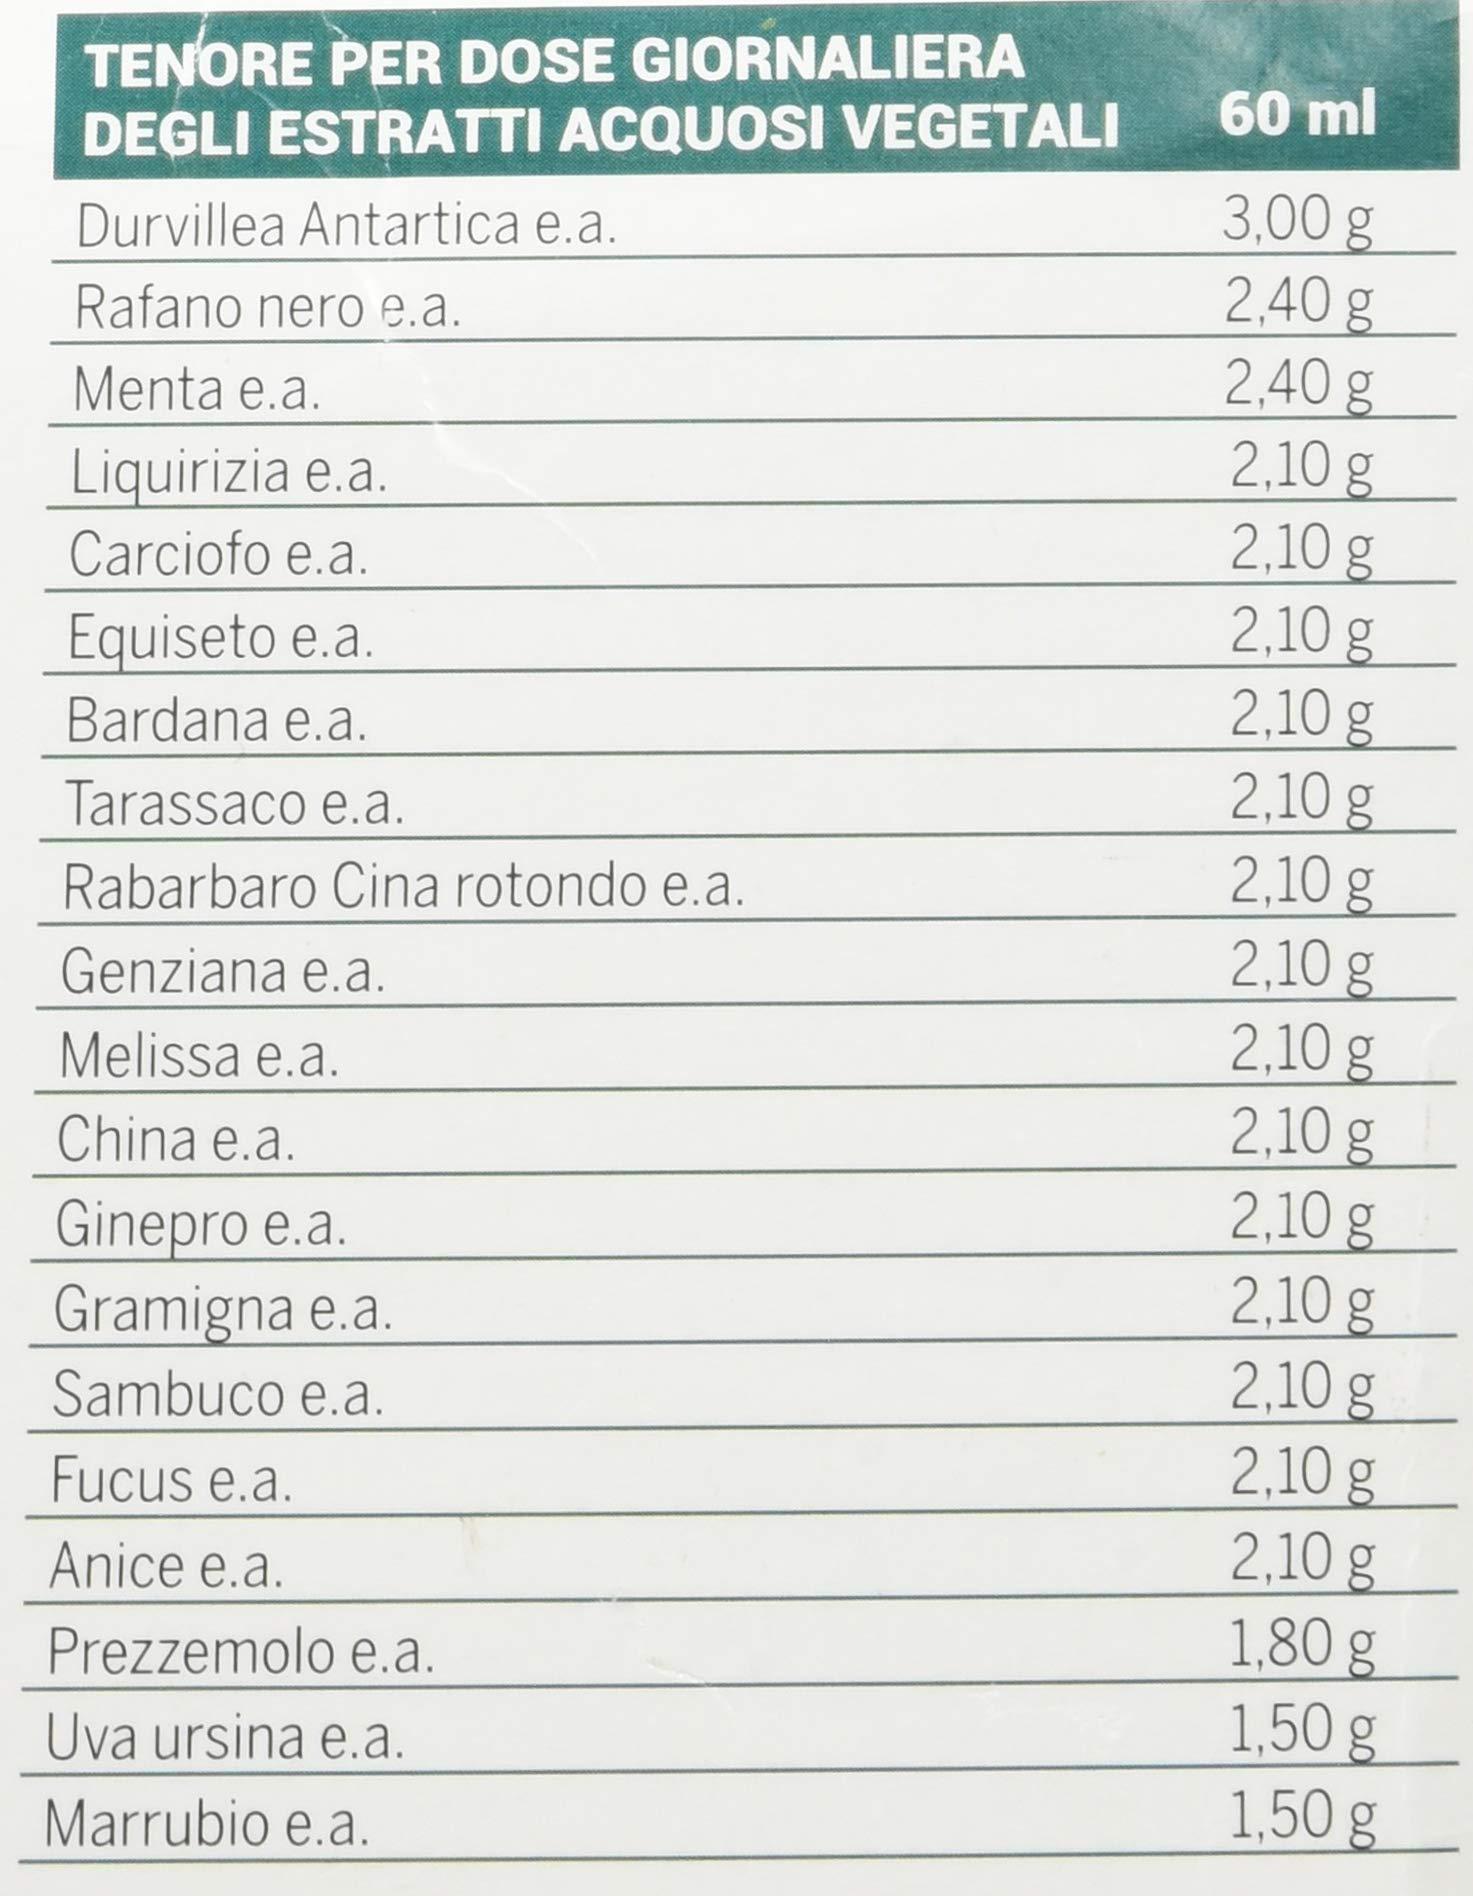 Gianluca Mech - Depurativo Antartico, Diuretico Secondo il Metodo Decottopia in Formato Decopocket - 16 Stick da 30 ml 1 spesavip